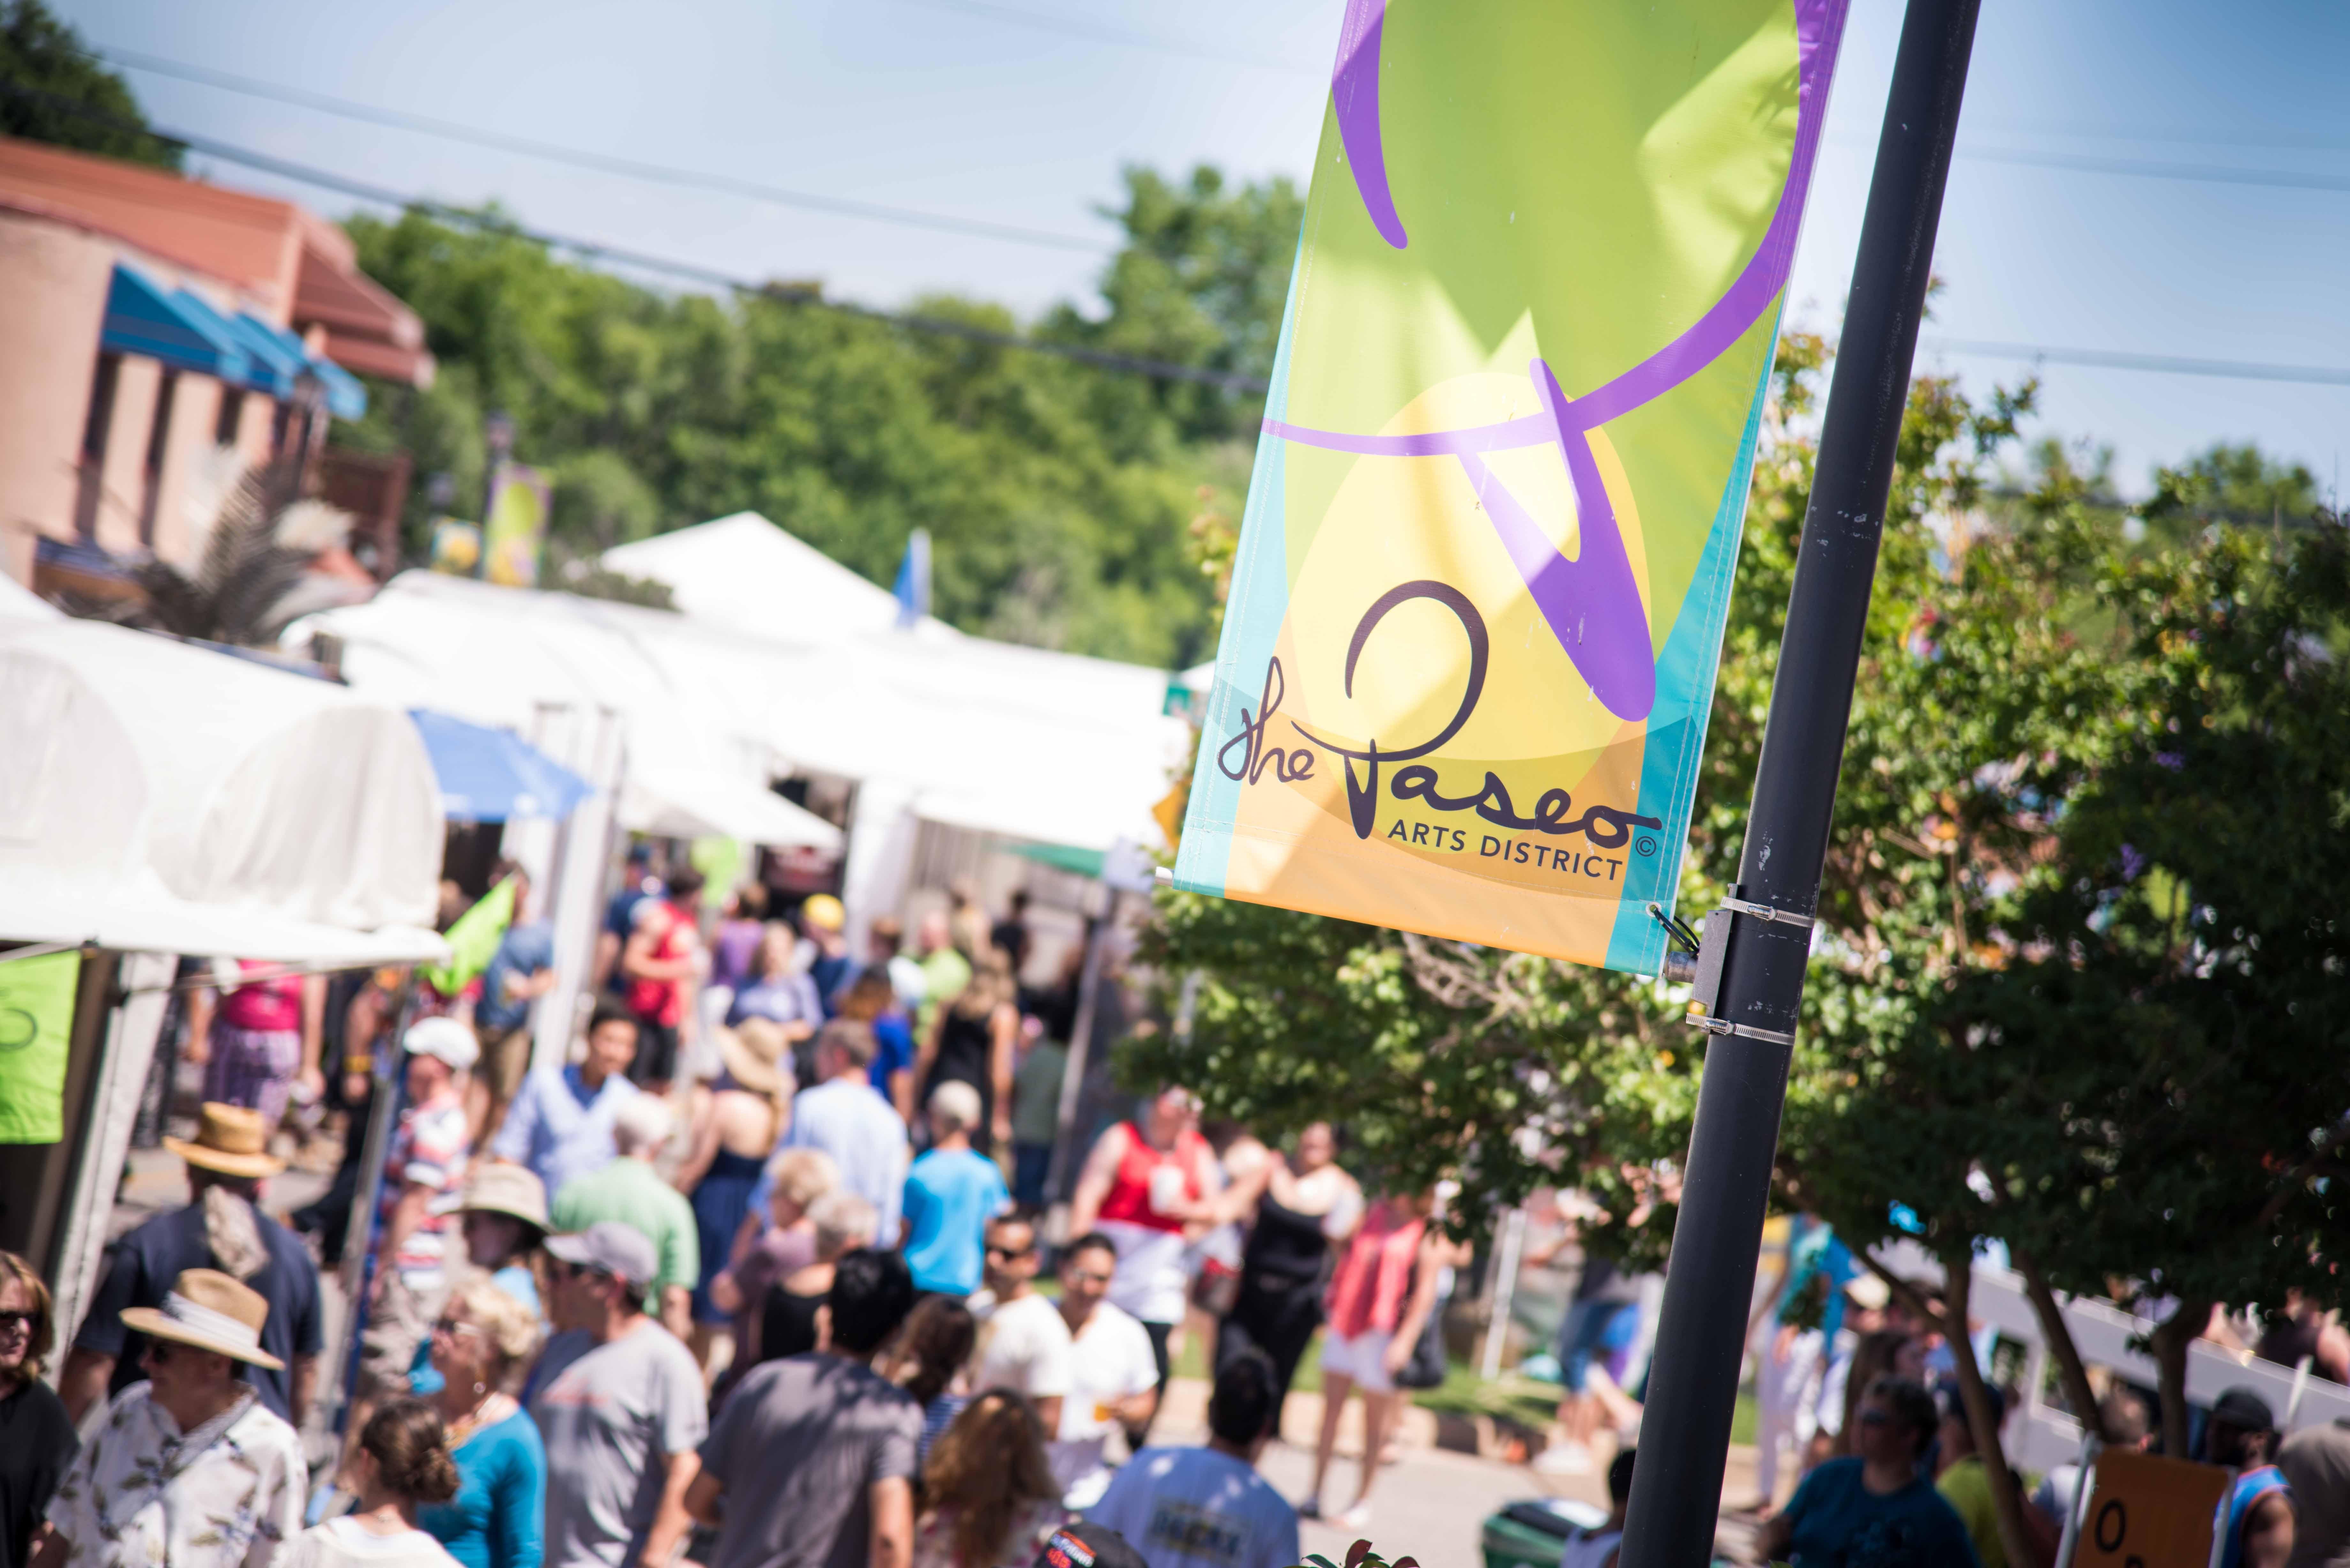 Paseo Arts Festival 2020 Find Festival Information Visit Okc